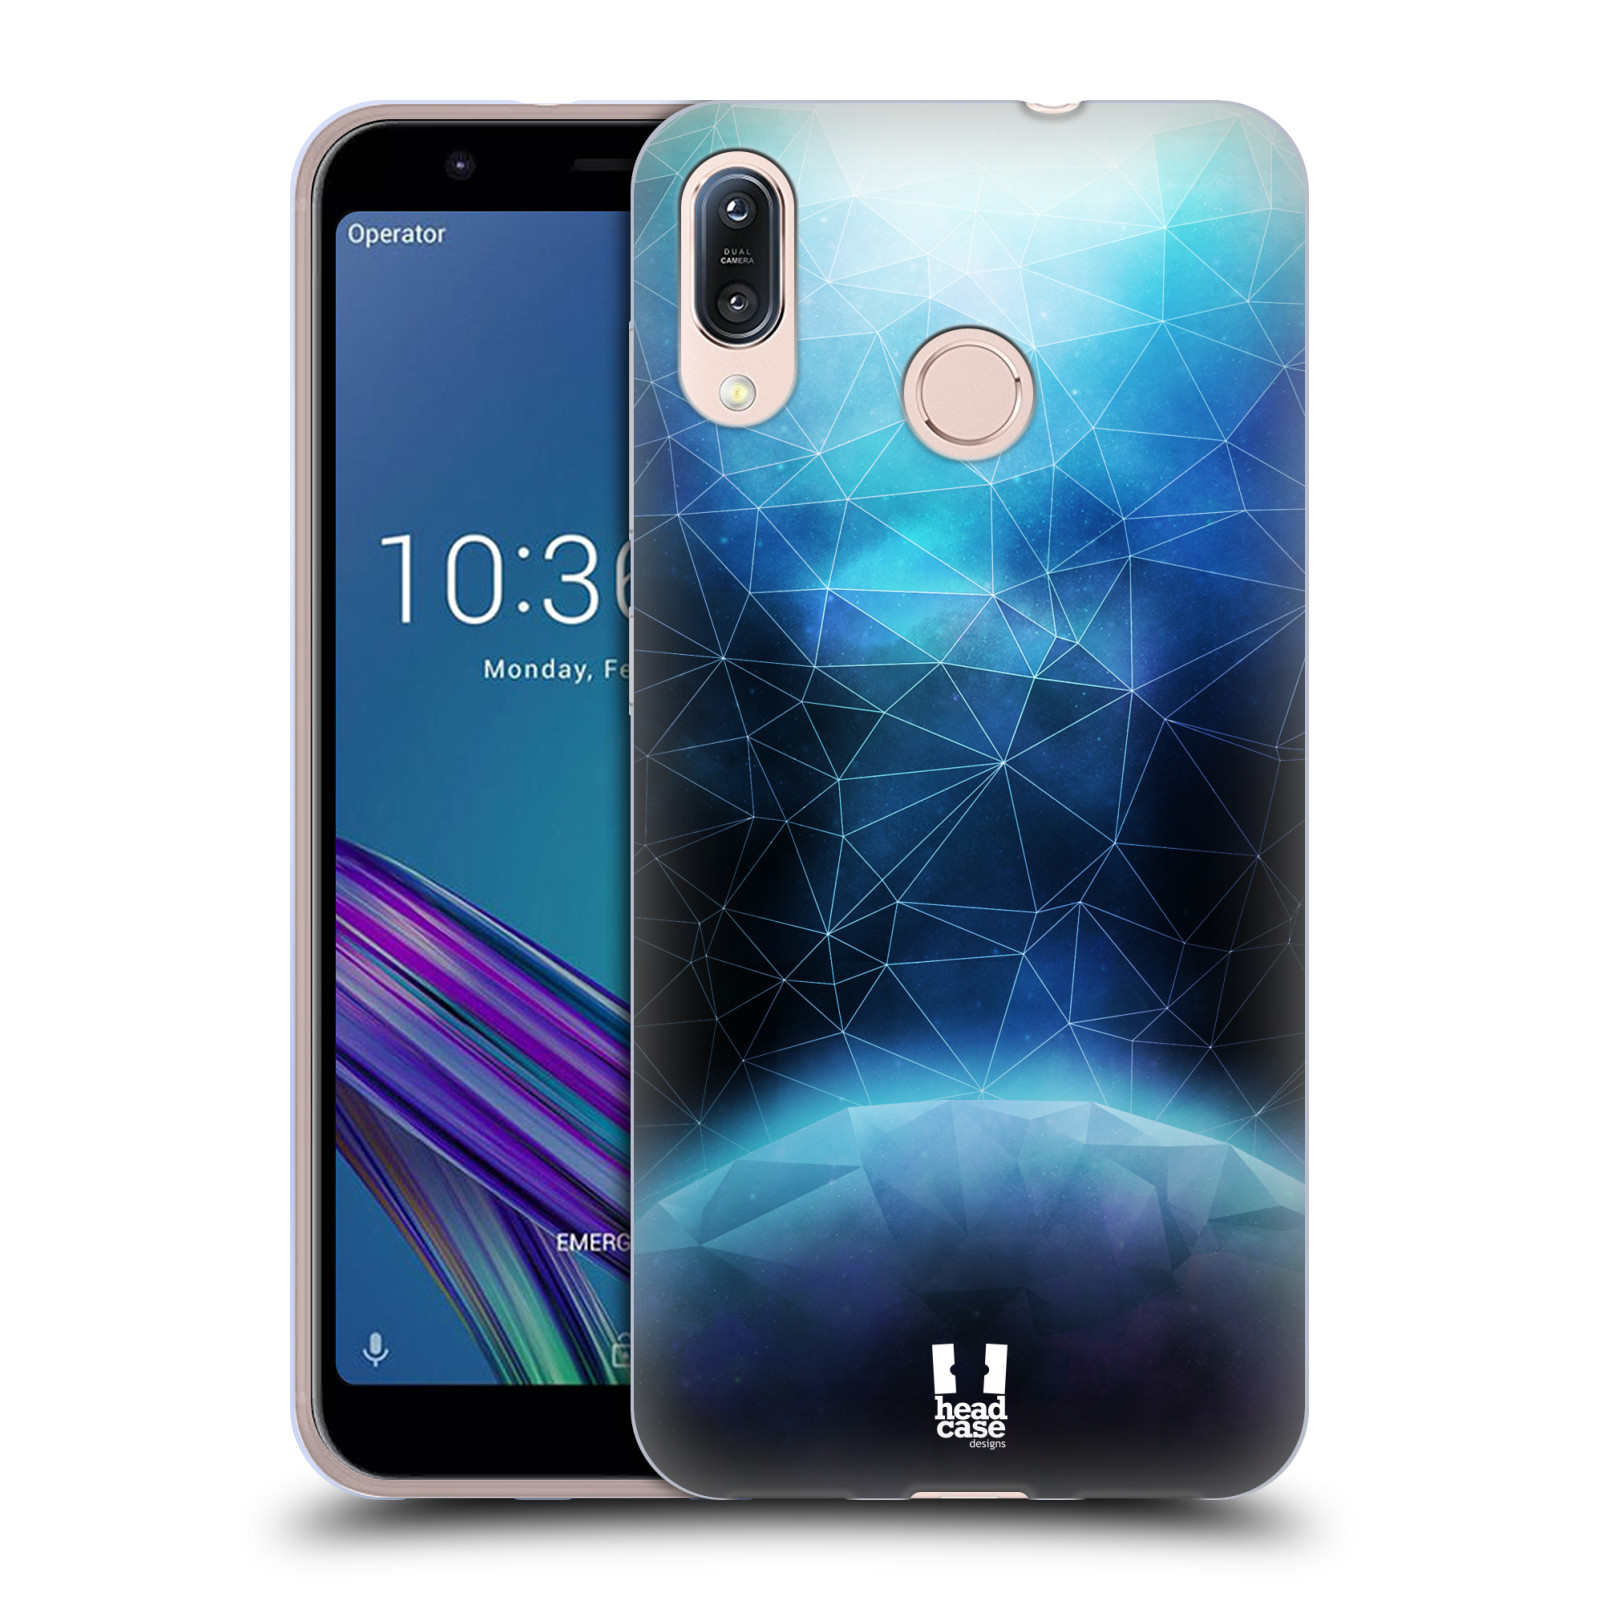 Silikonové pouzdro na mobil Asus Zenfone Max M1 ZB555KL - Head Case - UNIVERSE ABSORB